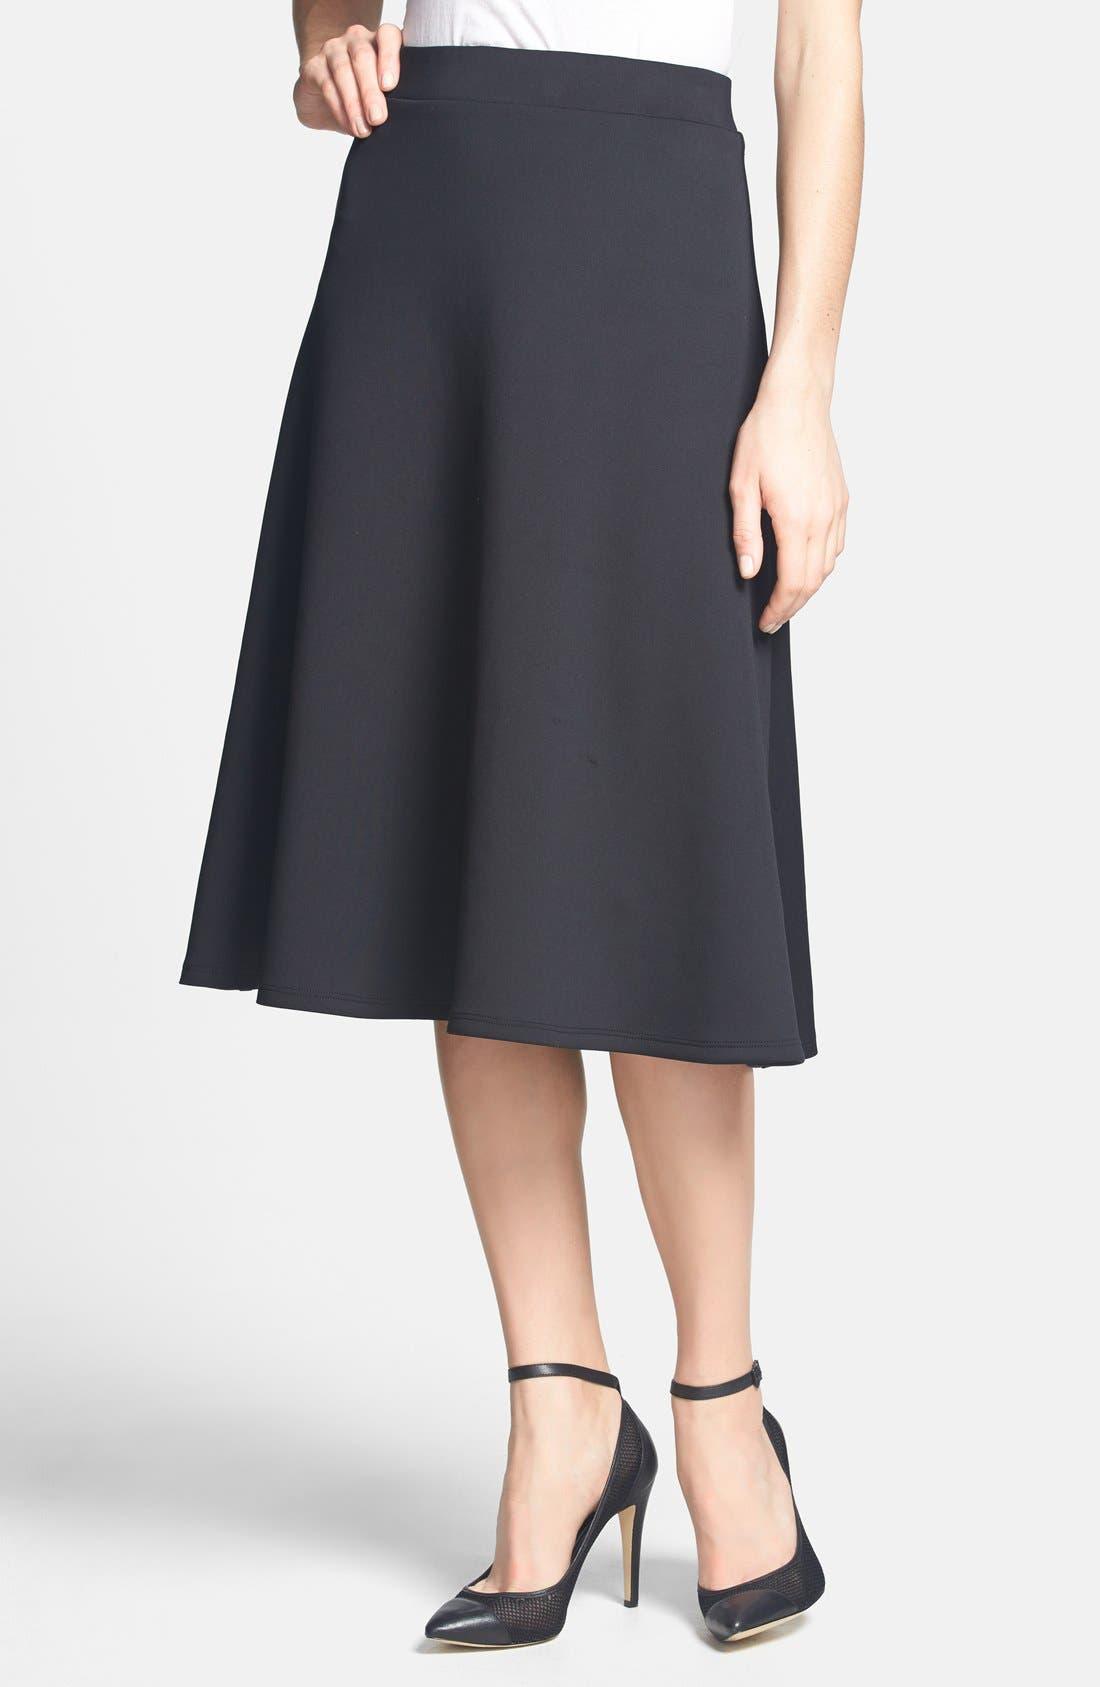 Alternate Image 1 Selected - Bailey 44 'Swingin' A-Line Midi Skirt